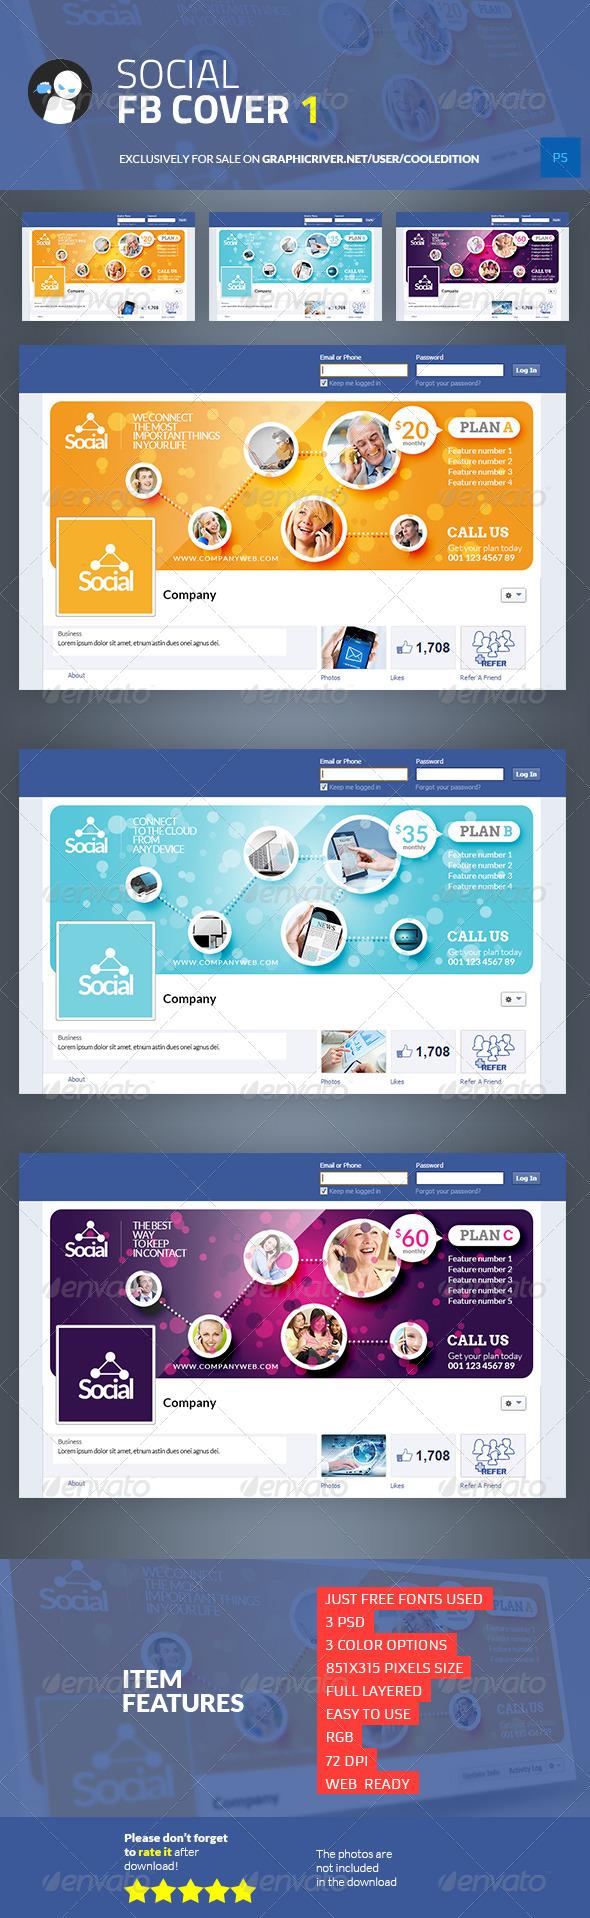 GraphicRiver Social Facebook Cover 1 6783158